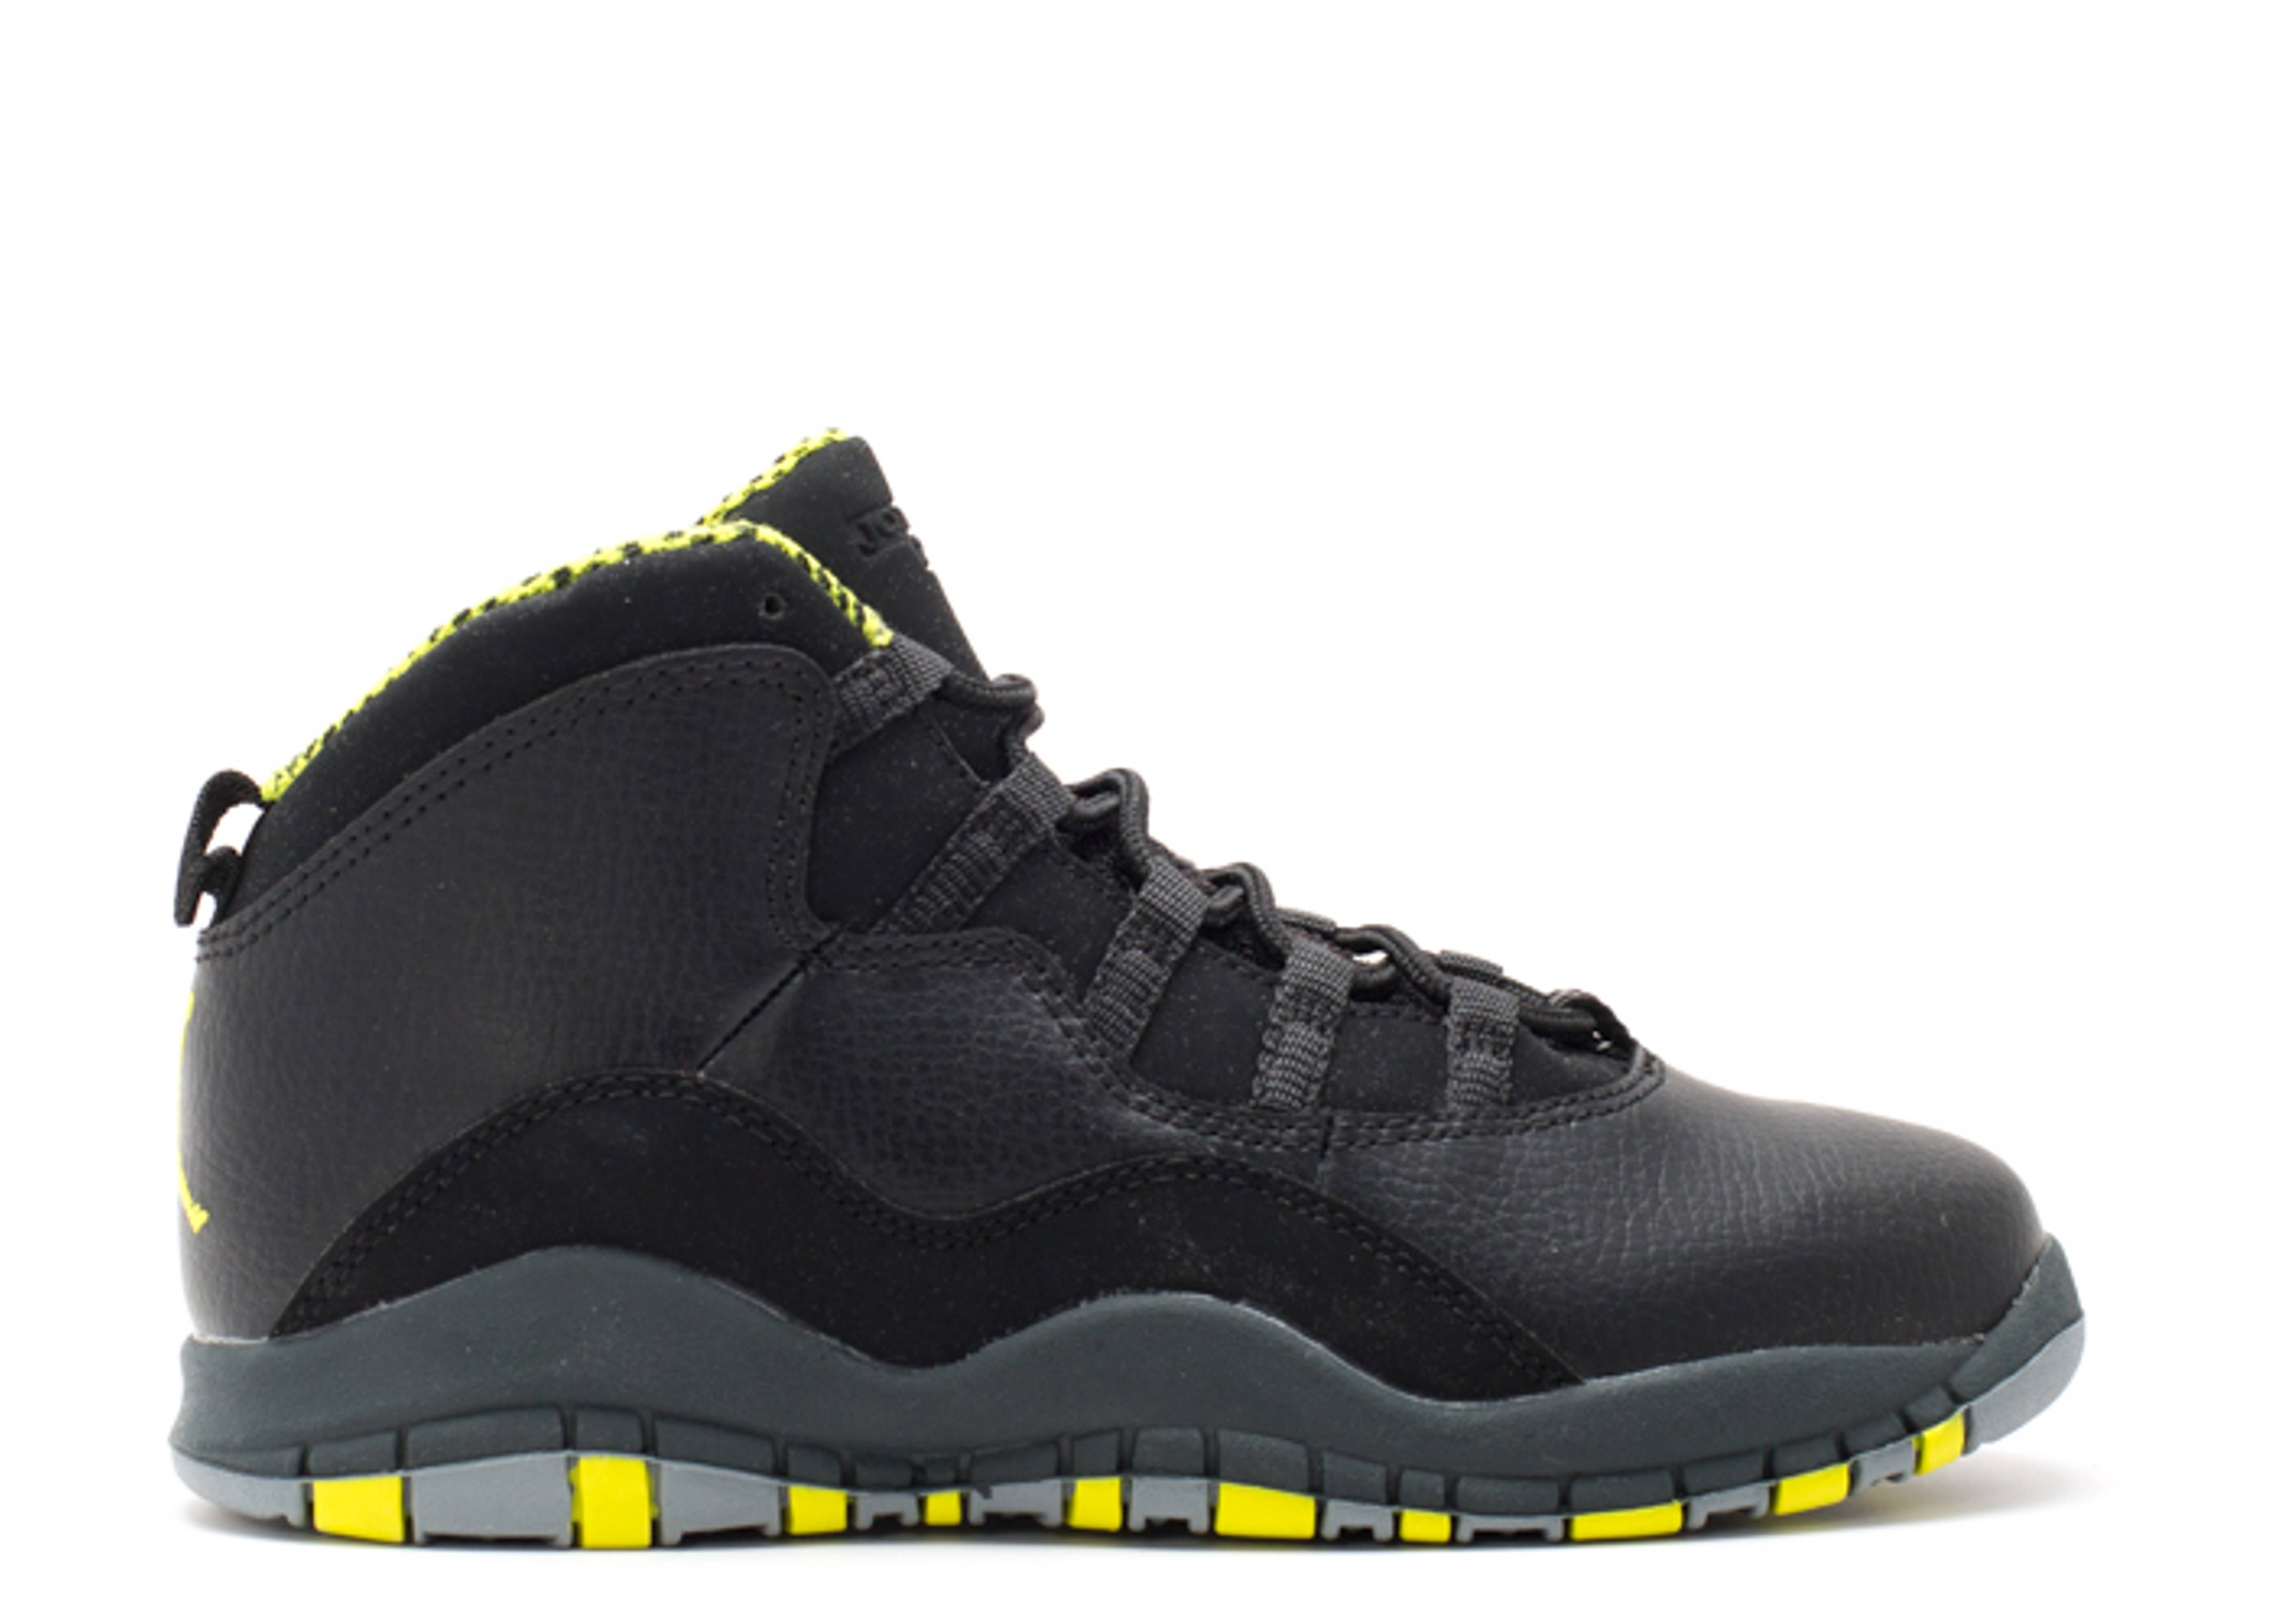 size 40 0daf8 9704e Jordan 10 Retro (ps) - Air Jordan - 310807 033 - black / vnm ...